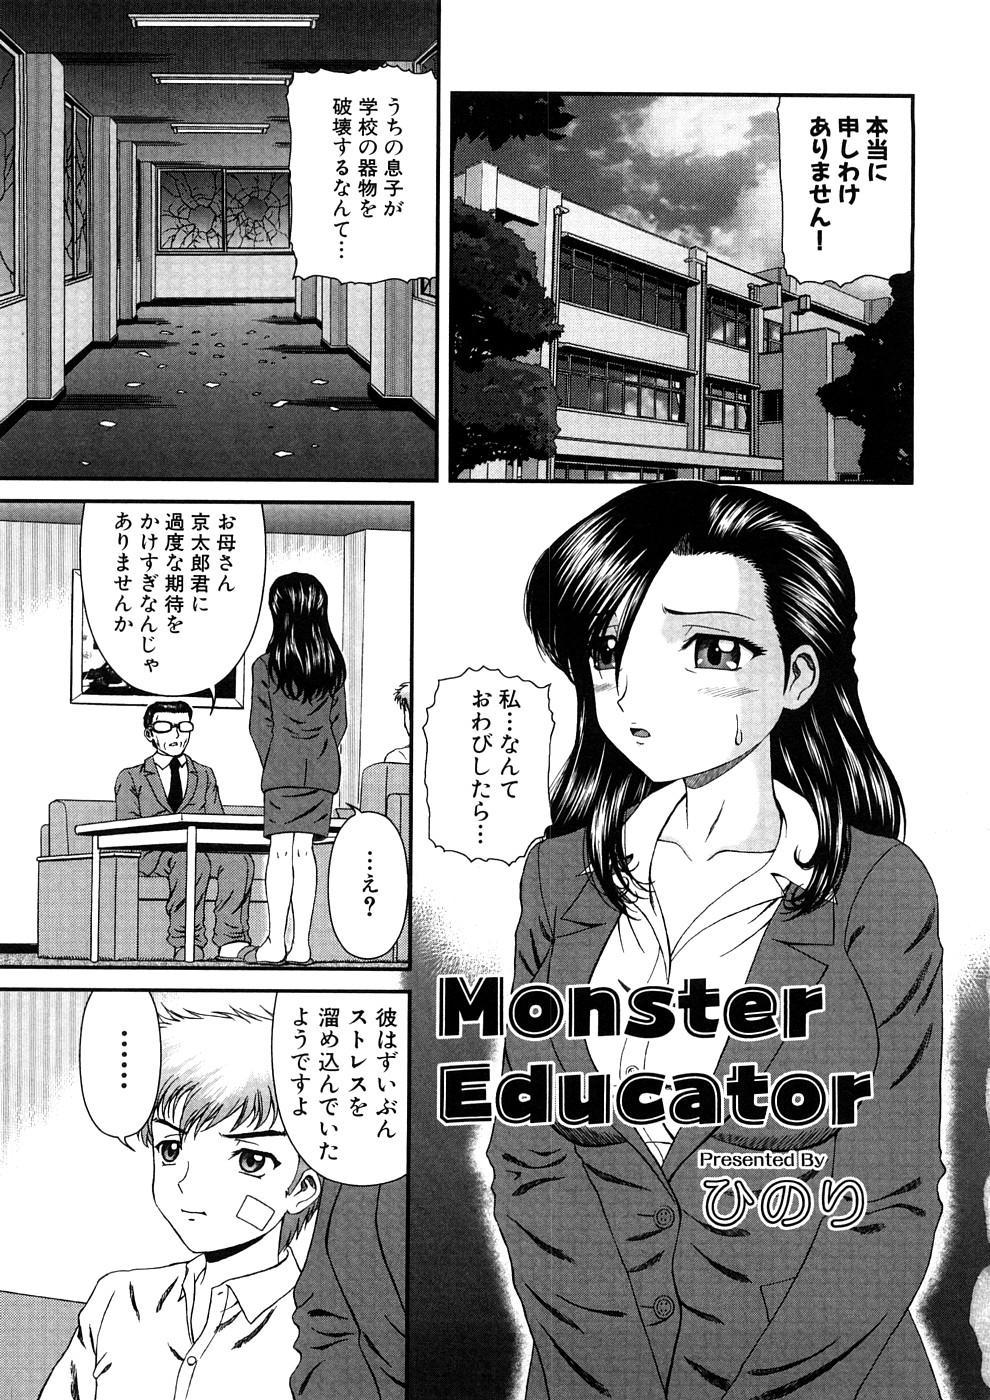 Geki Yaba Anthology Vol. 1 - Naka ni Dashite yo 139